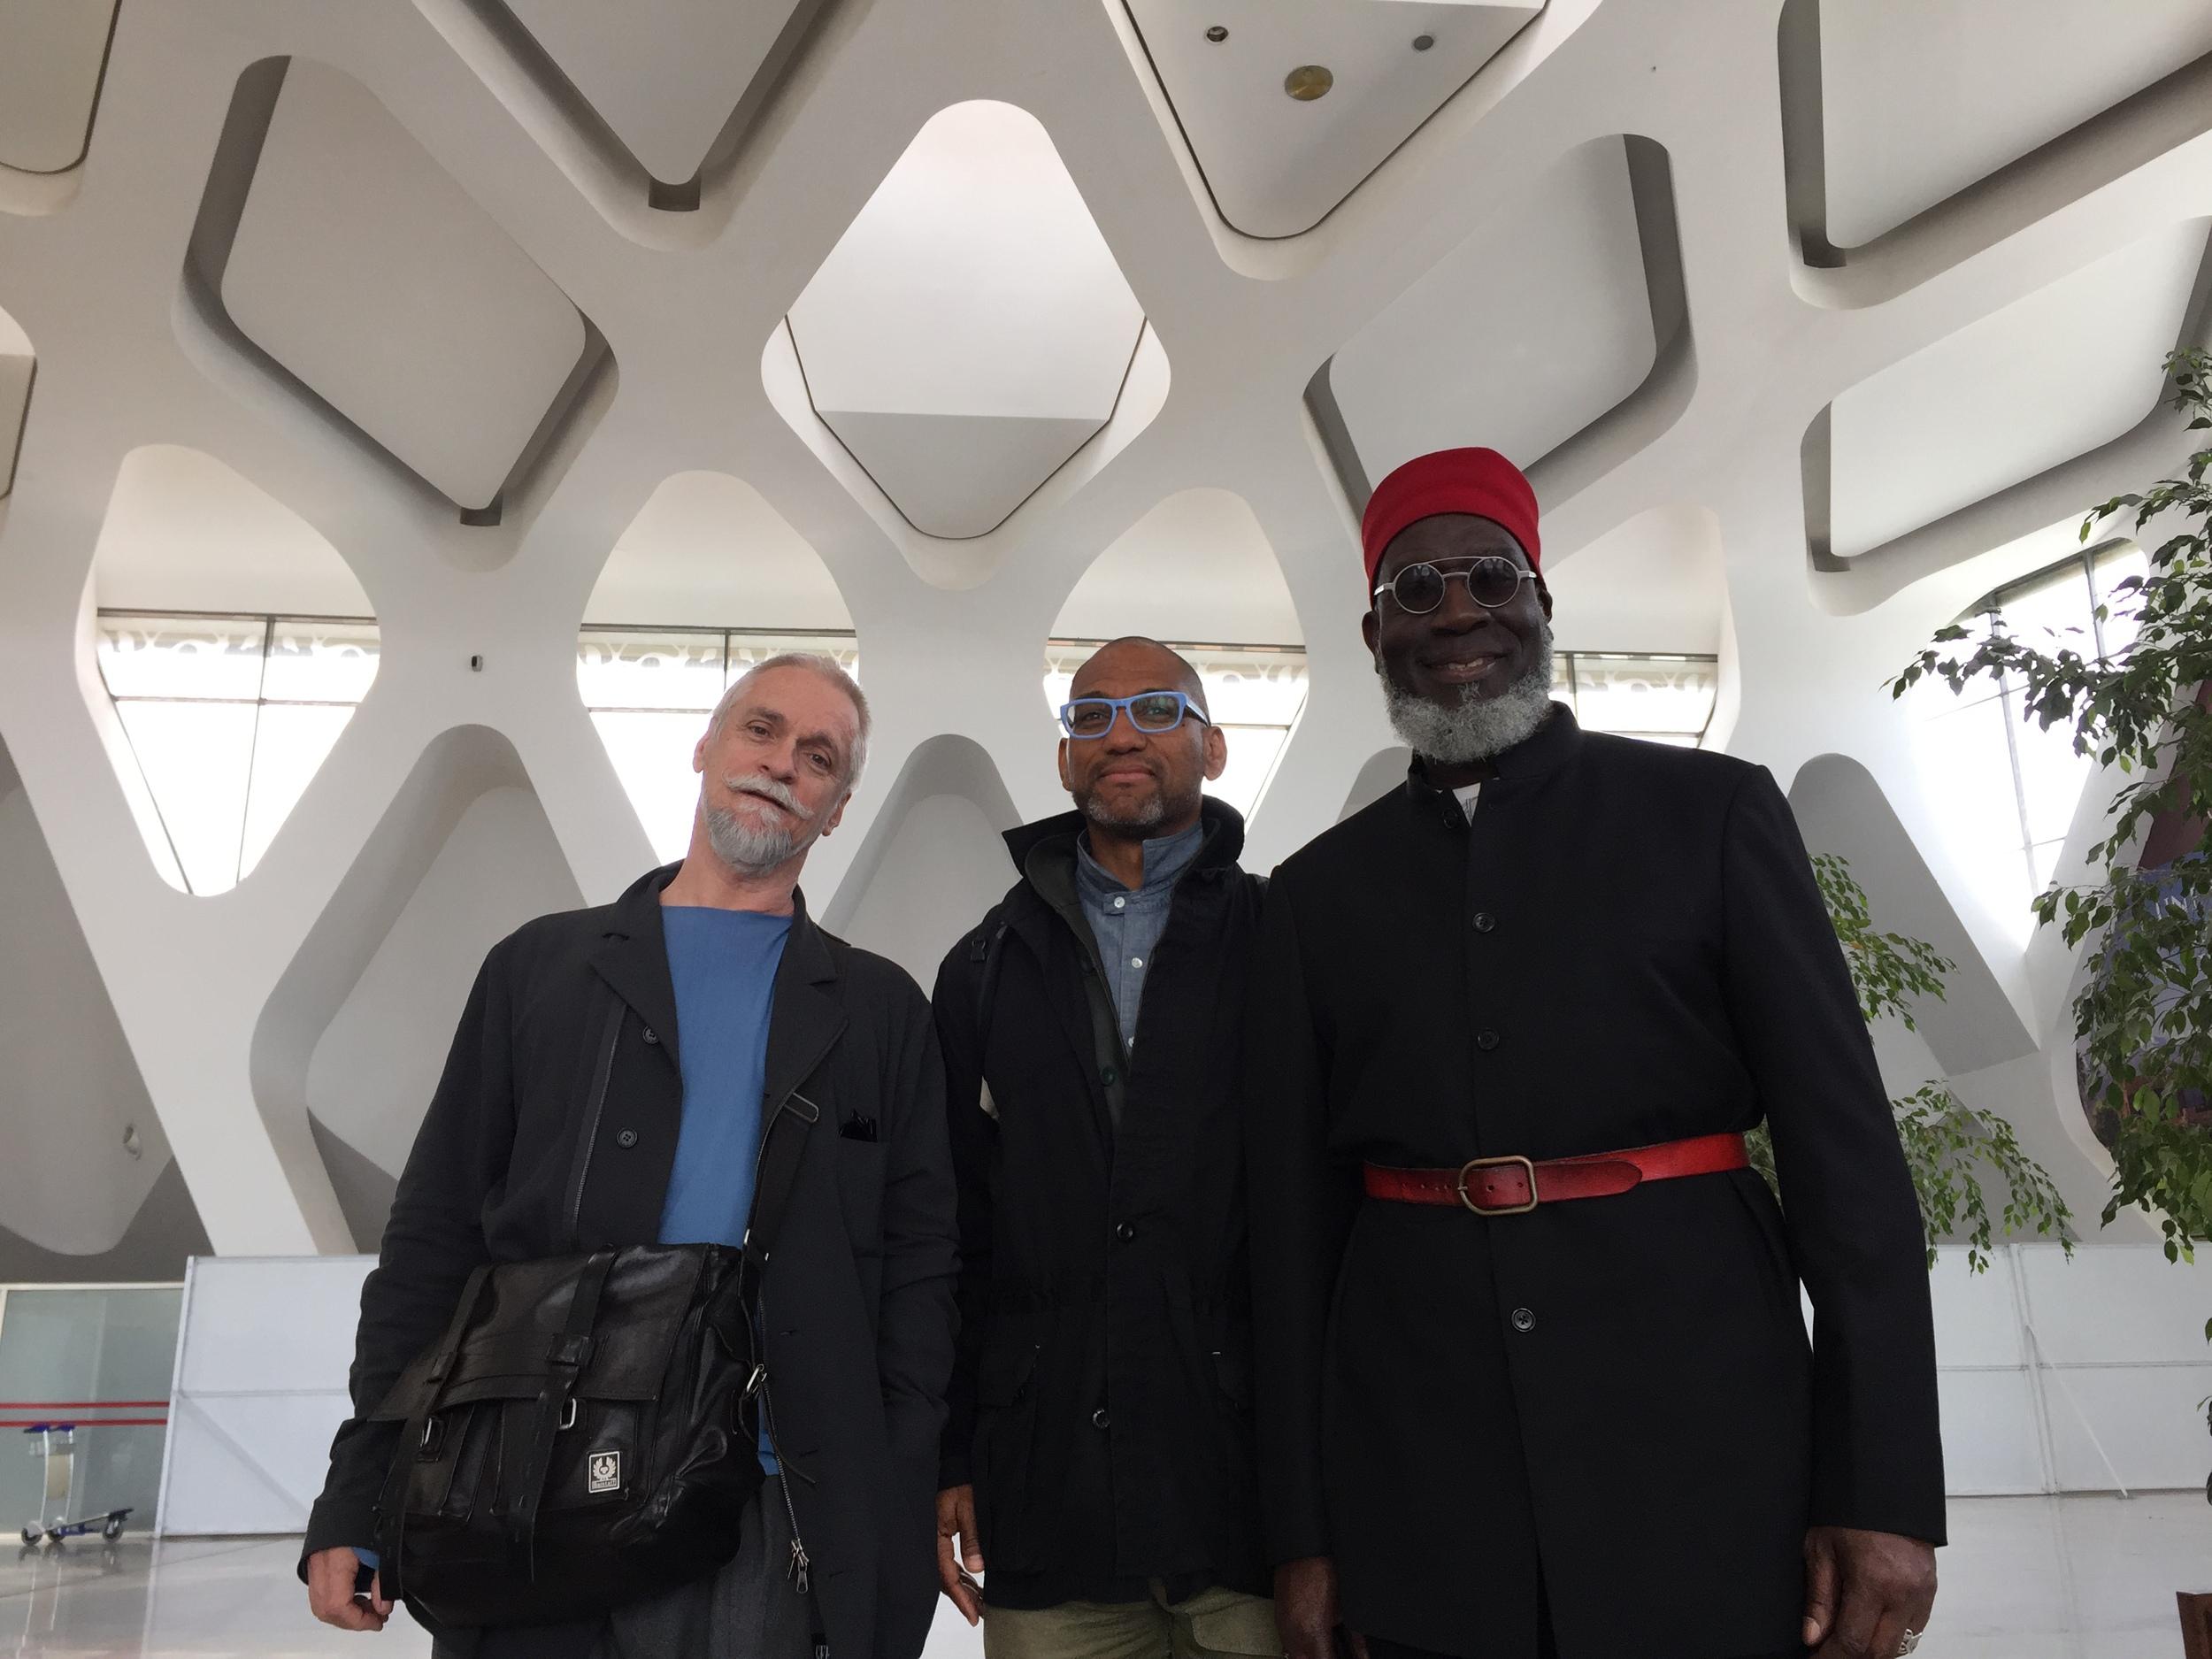 Wolfgang, King Britt and Jamaladeen Tacuma